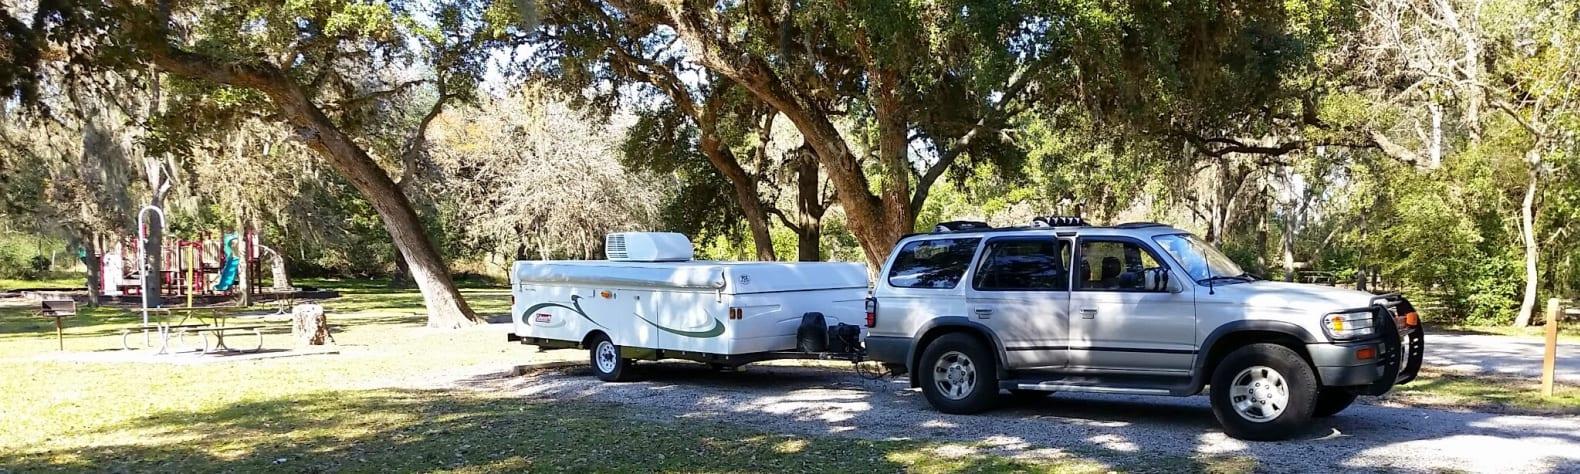 Texana Park and Campground